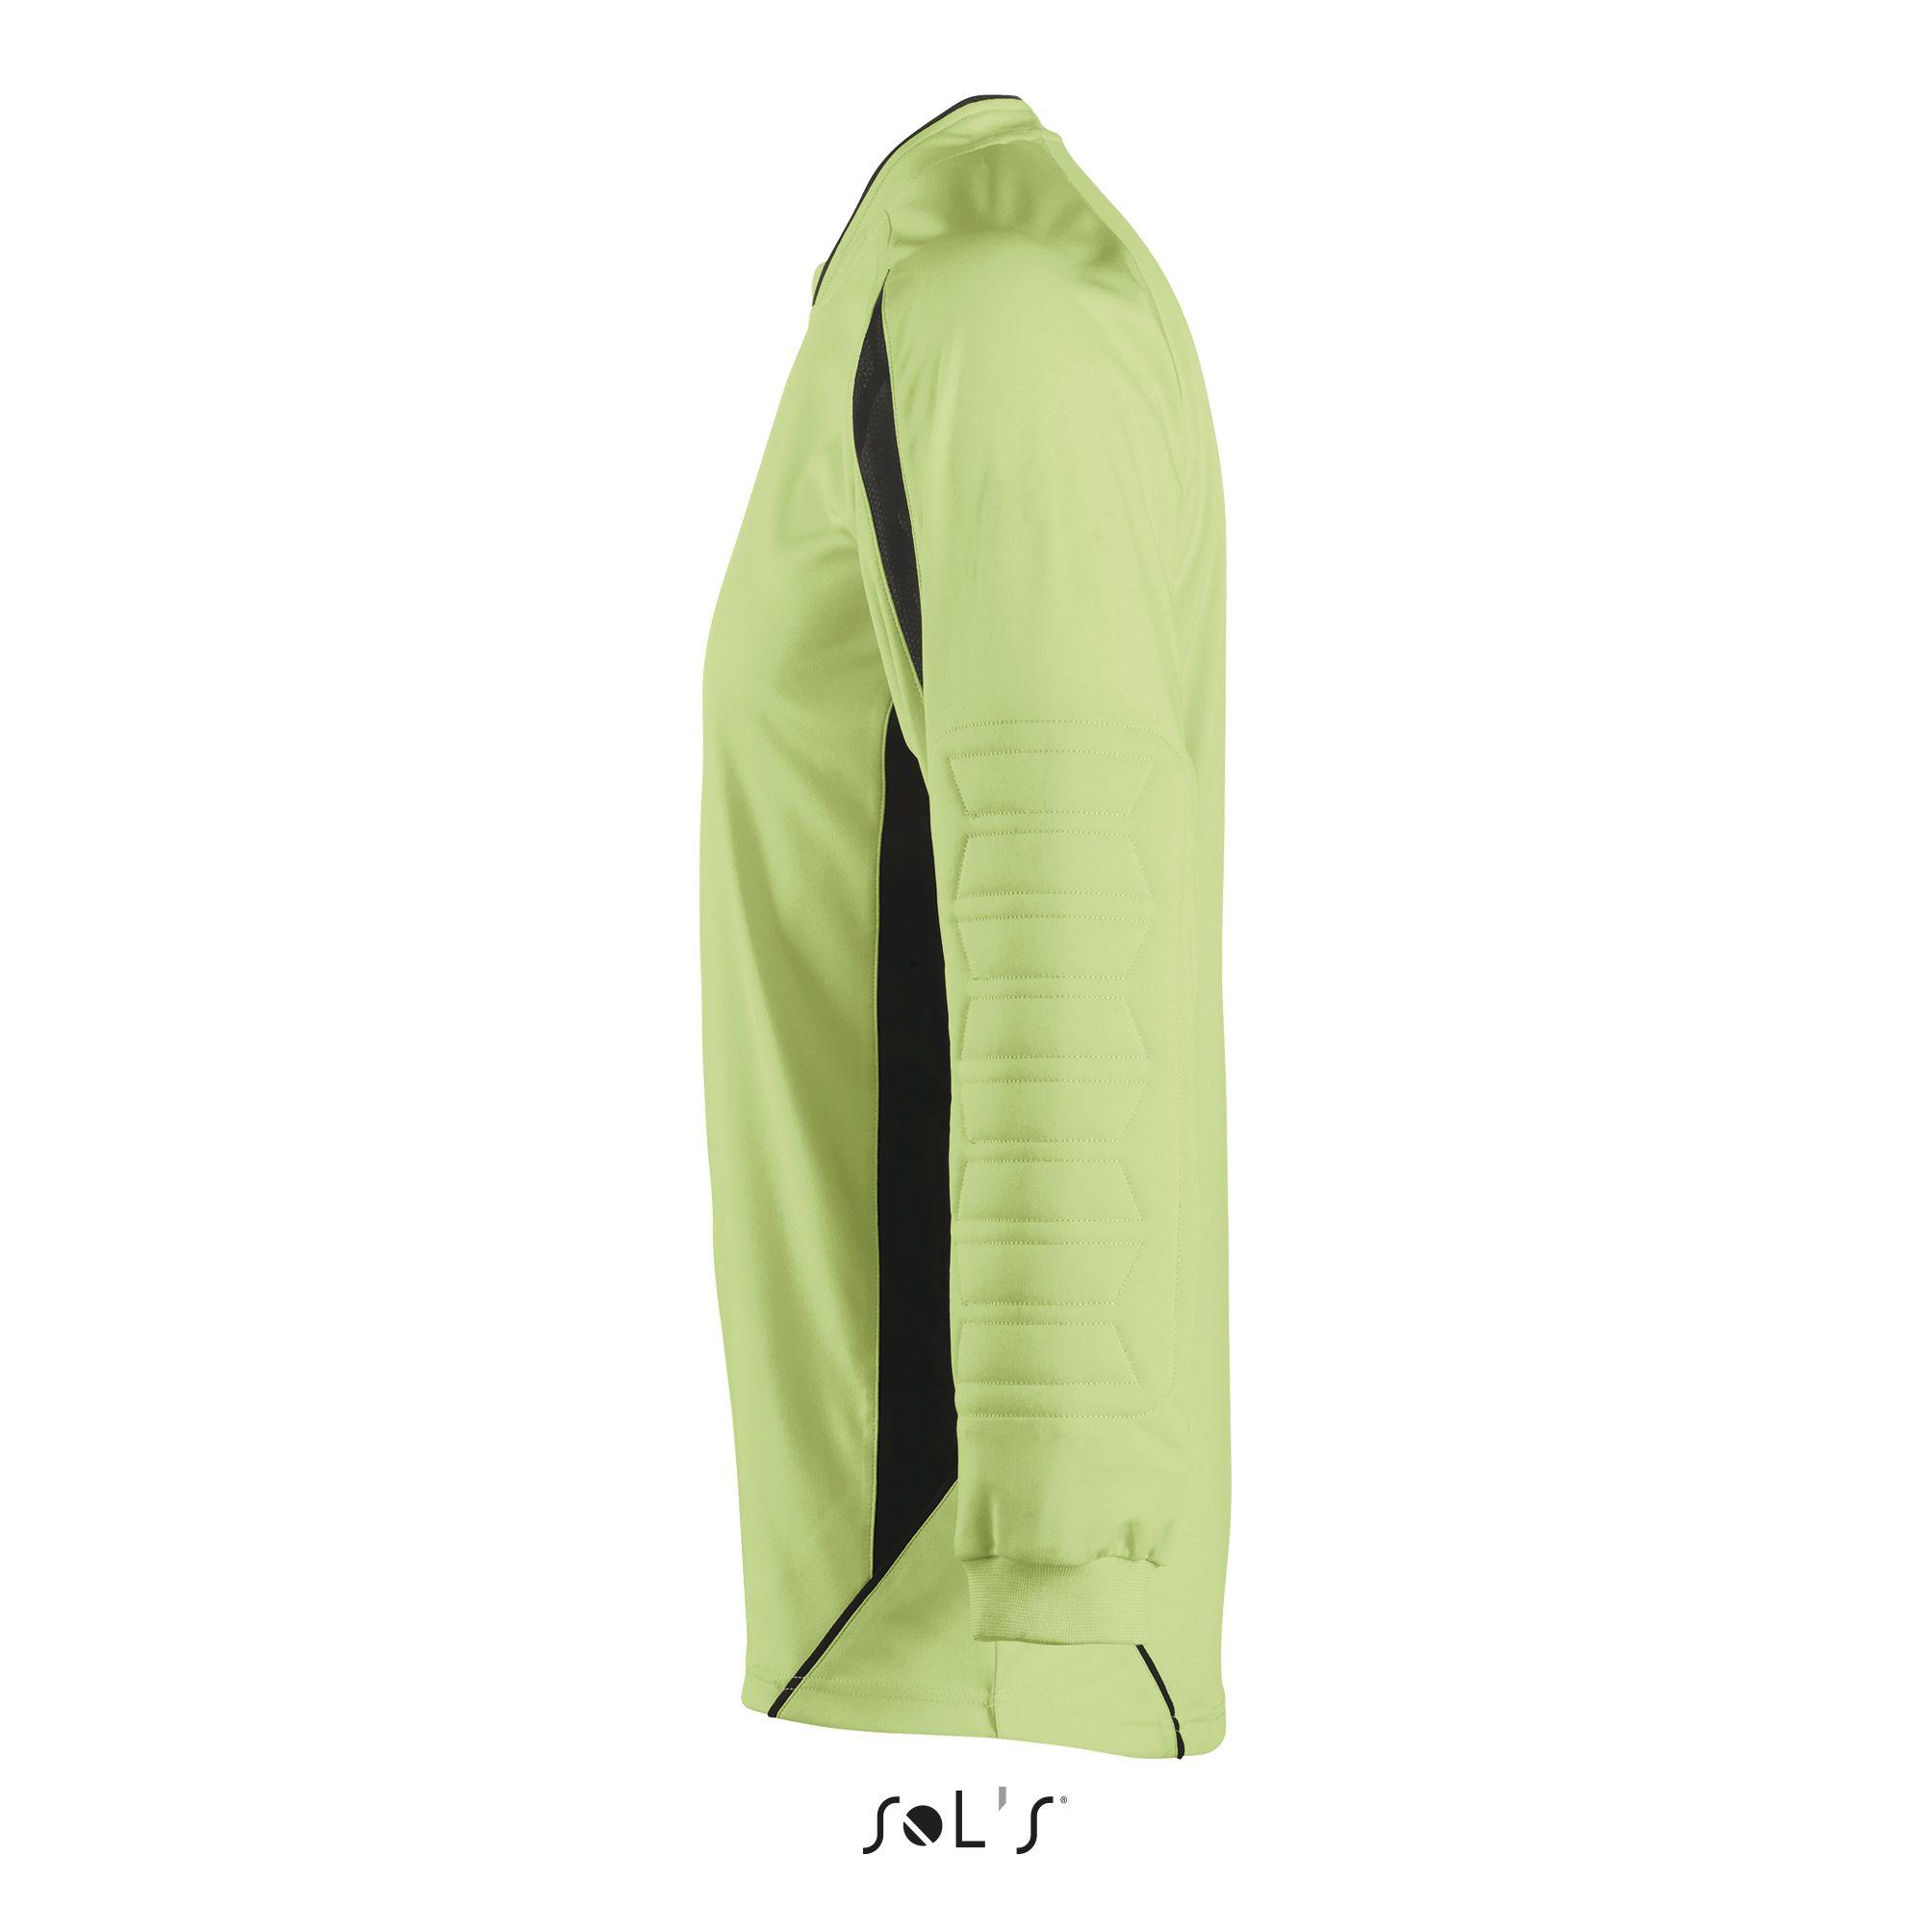 934 - Apple green / Black